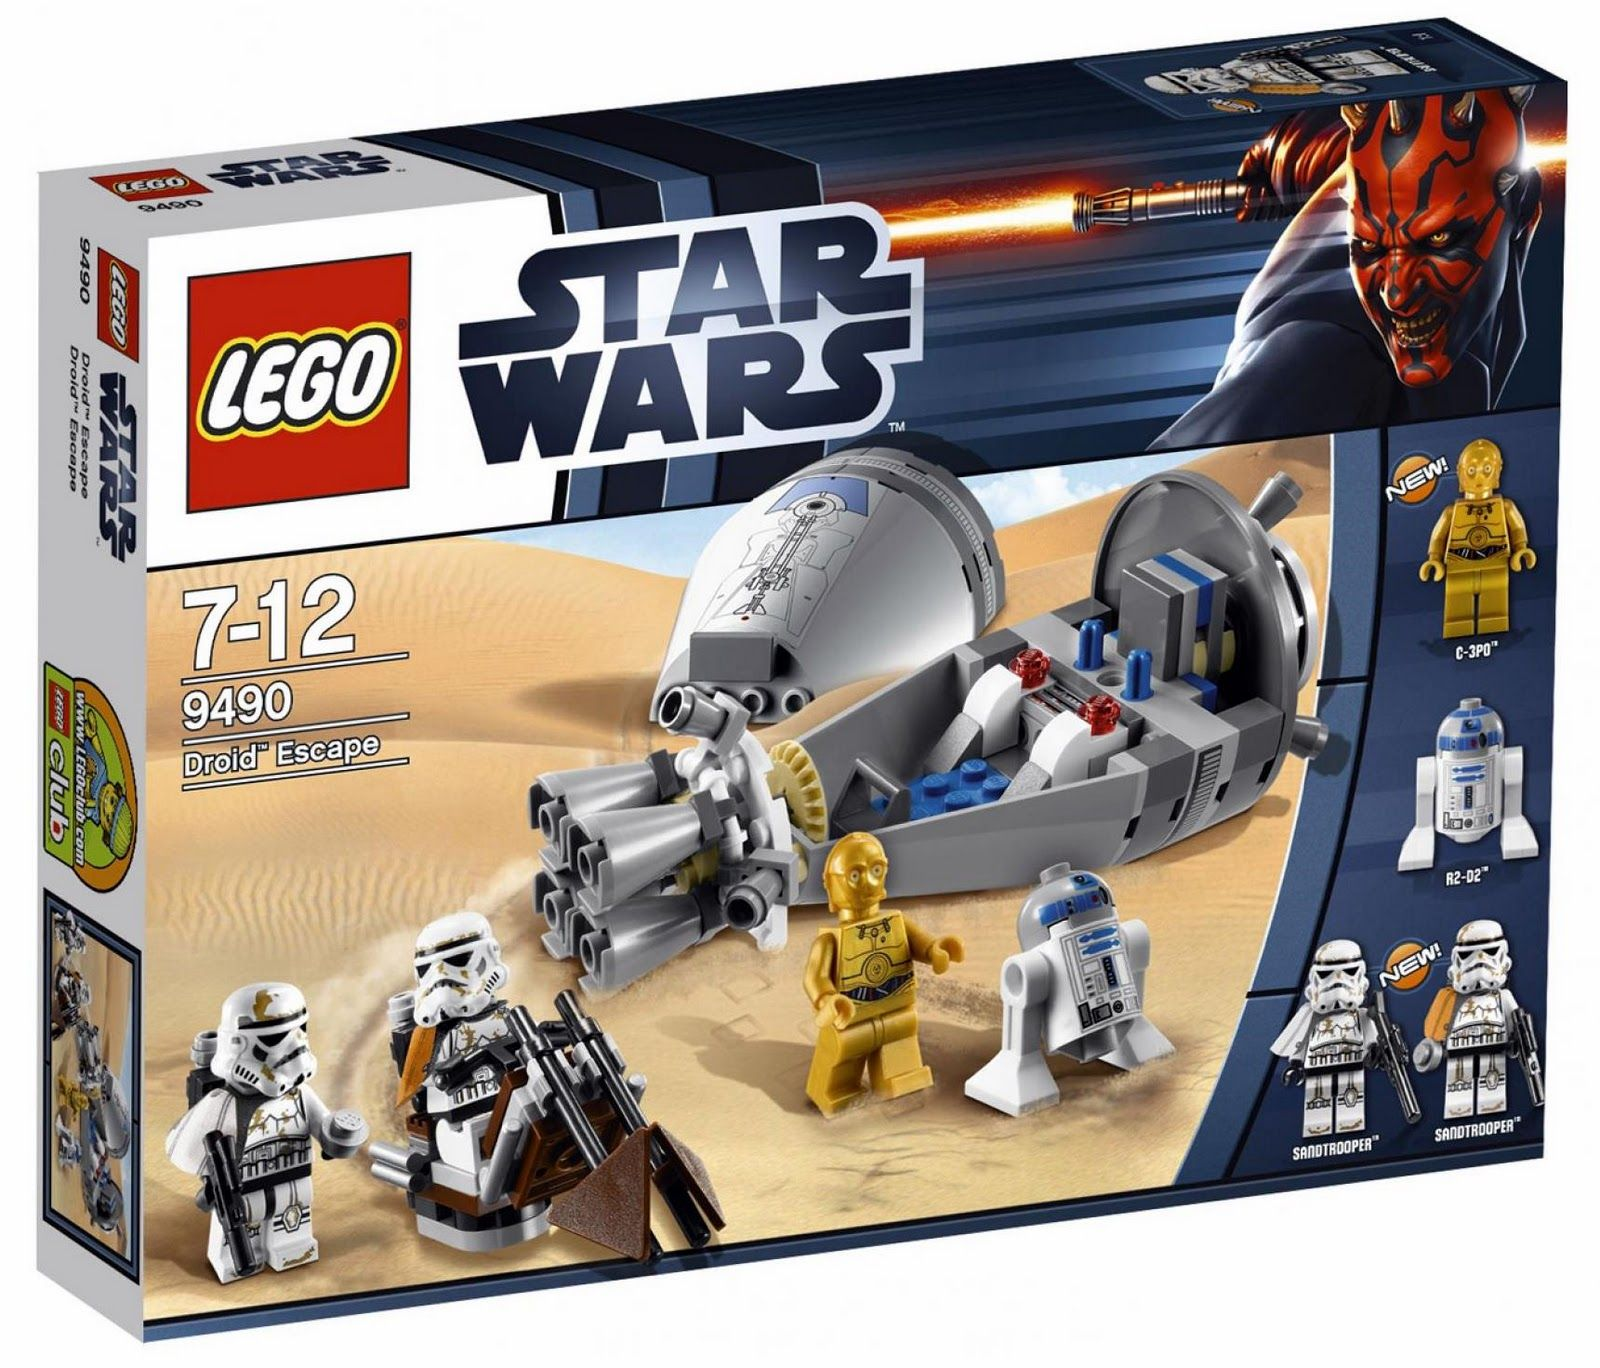 Trucs Wars Brown De The Brick Battle FoxLego 2012 PacksLes Star 34qcRjSA5L